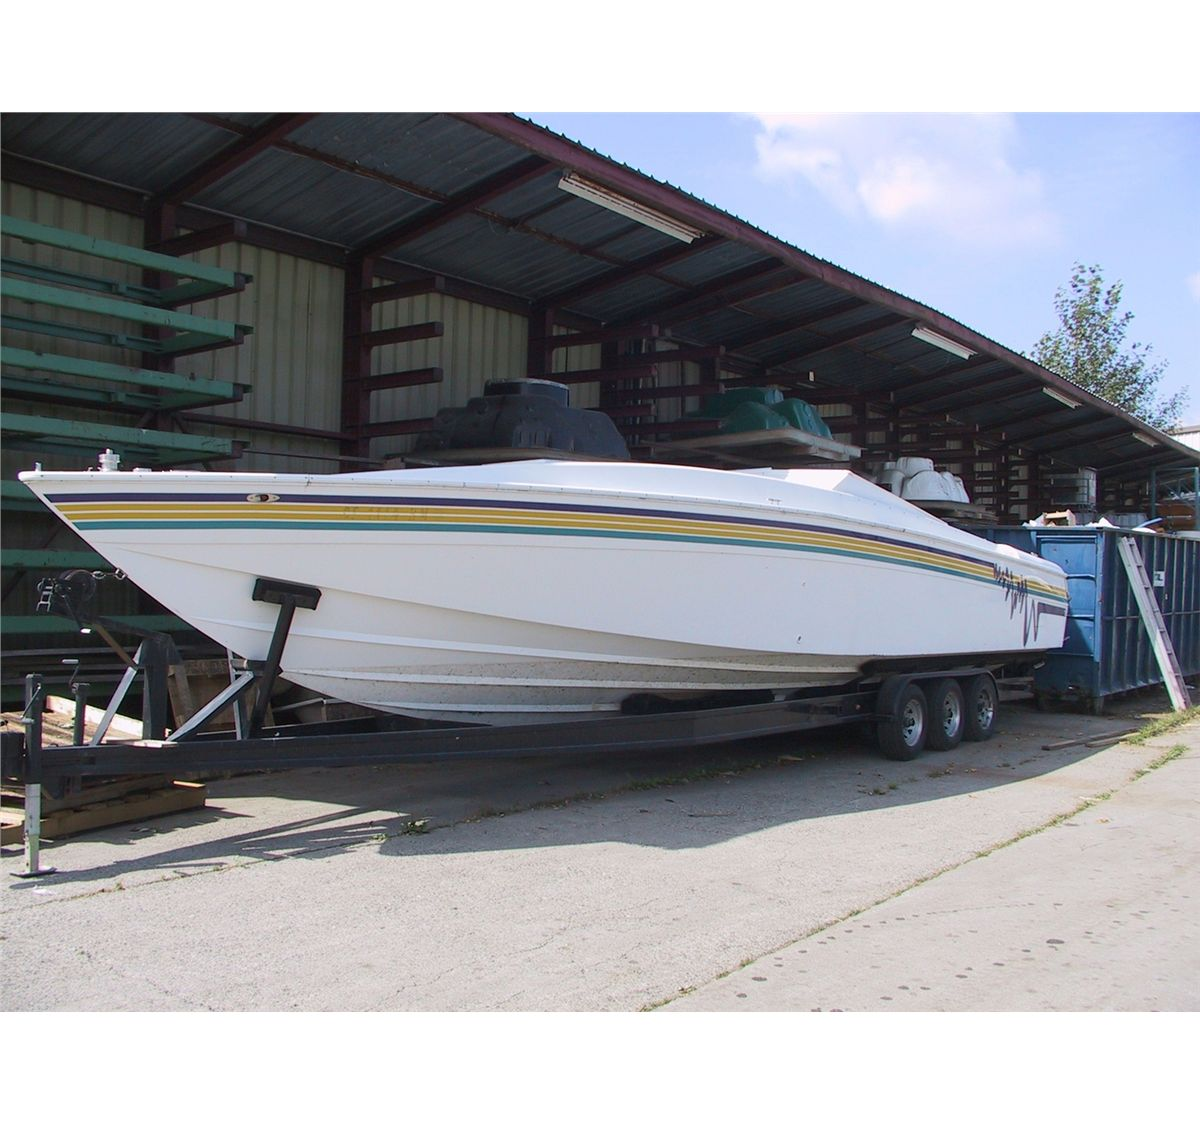 Corsa 40' Cigarette Boat 2pm Direct Liquidation 6990 Greenwood St  Burnaby